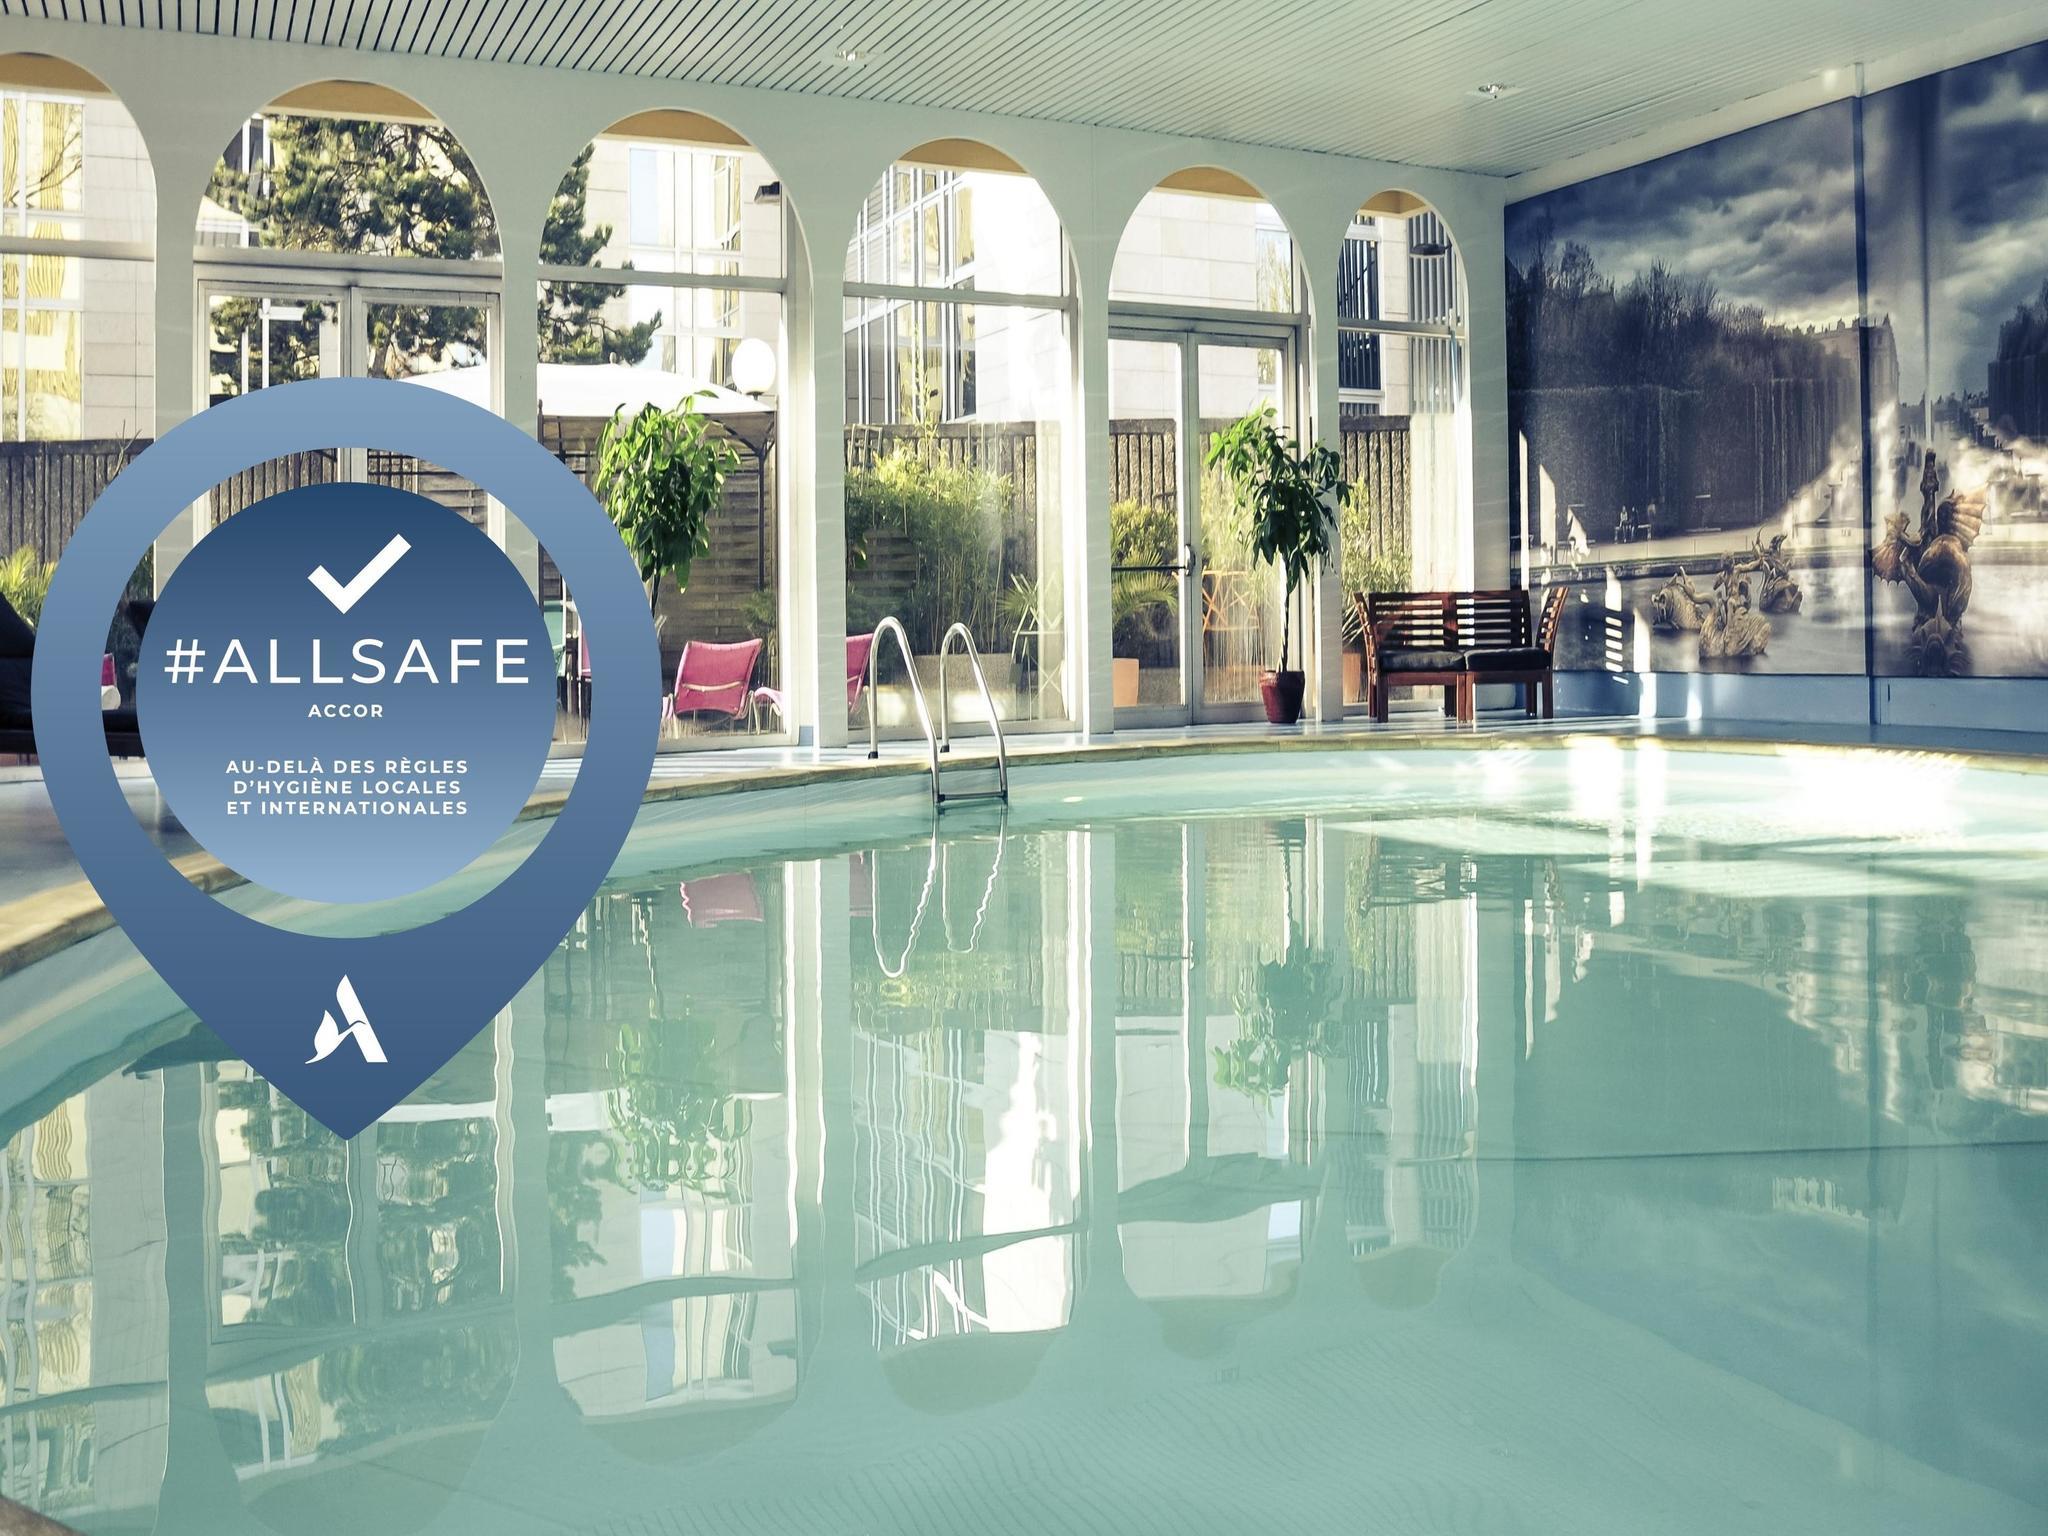 Hotel in VELIZY VILLACOUBLAY - Mercure Paris Velizy Hotel a79196c5f663